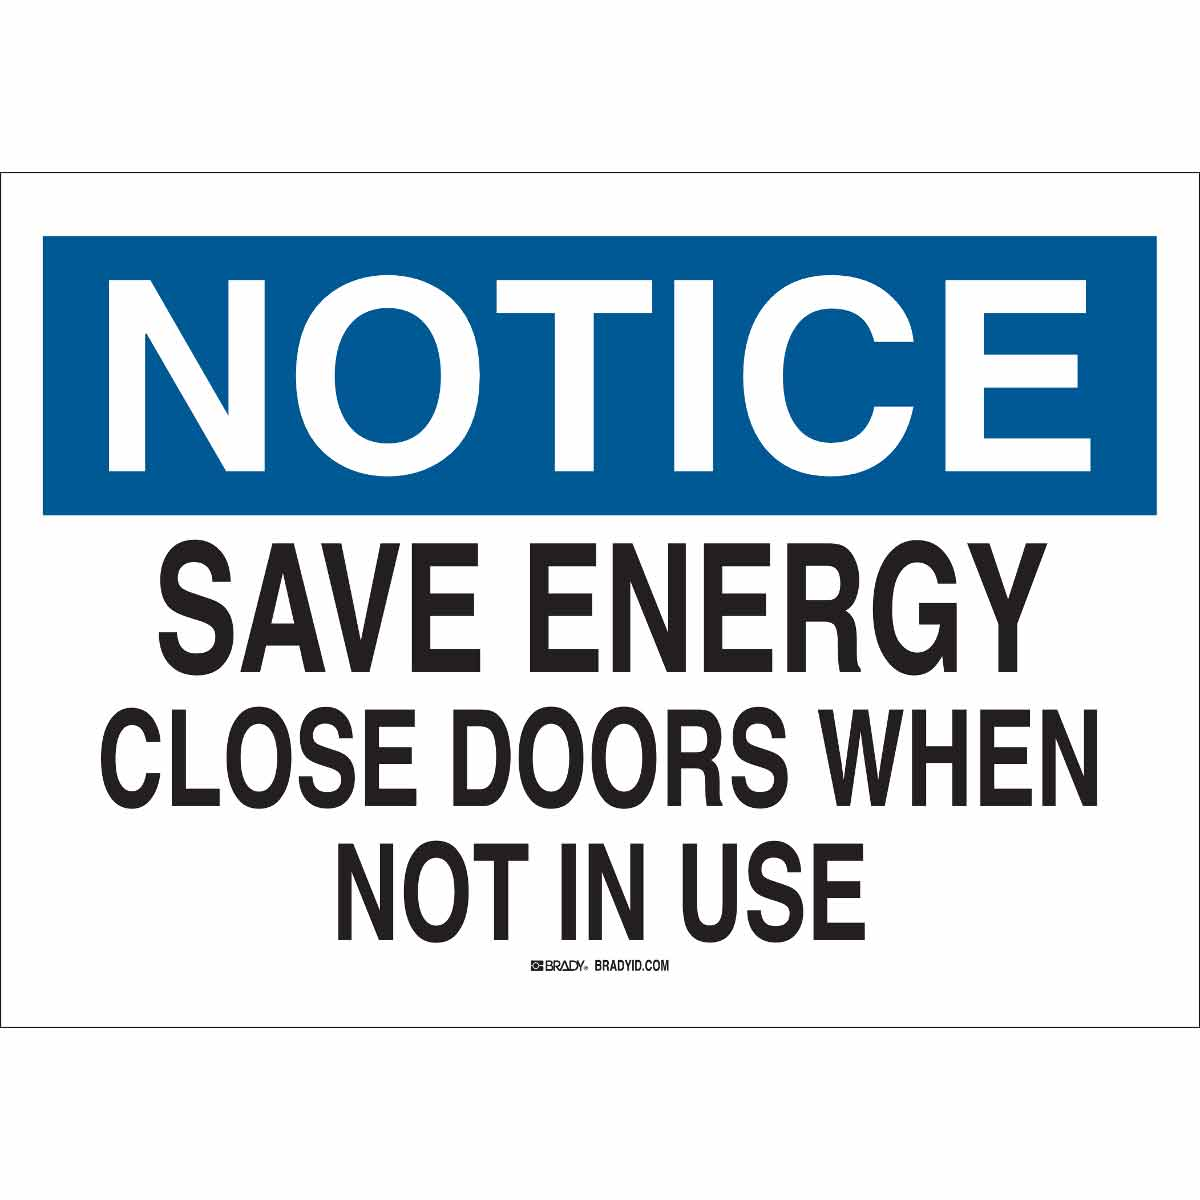 brady door sign save energy close doors when not in use bradyid com